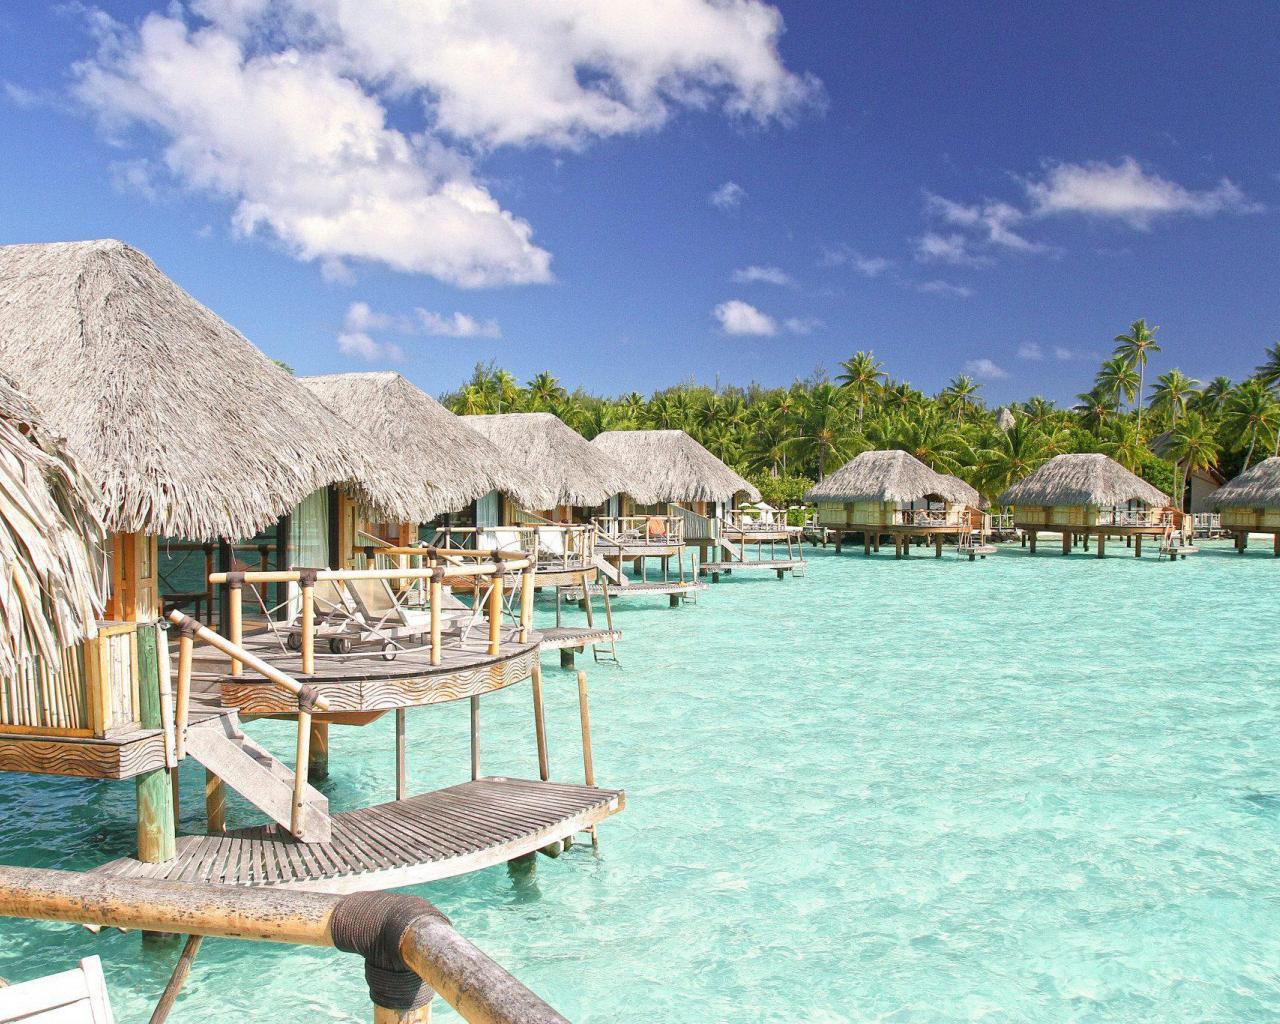 Bora bora water villas bungalows at pearl beach spa and resort 1280x1024